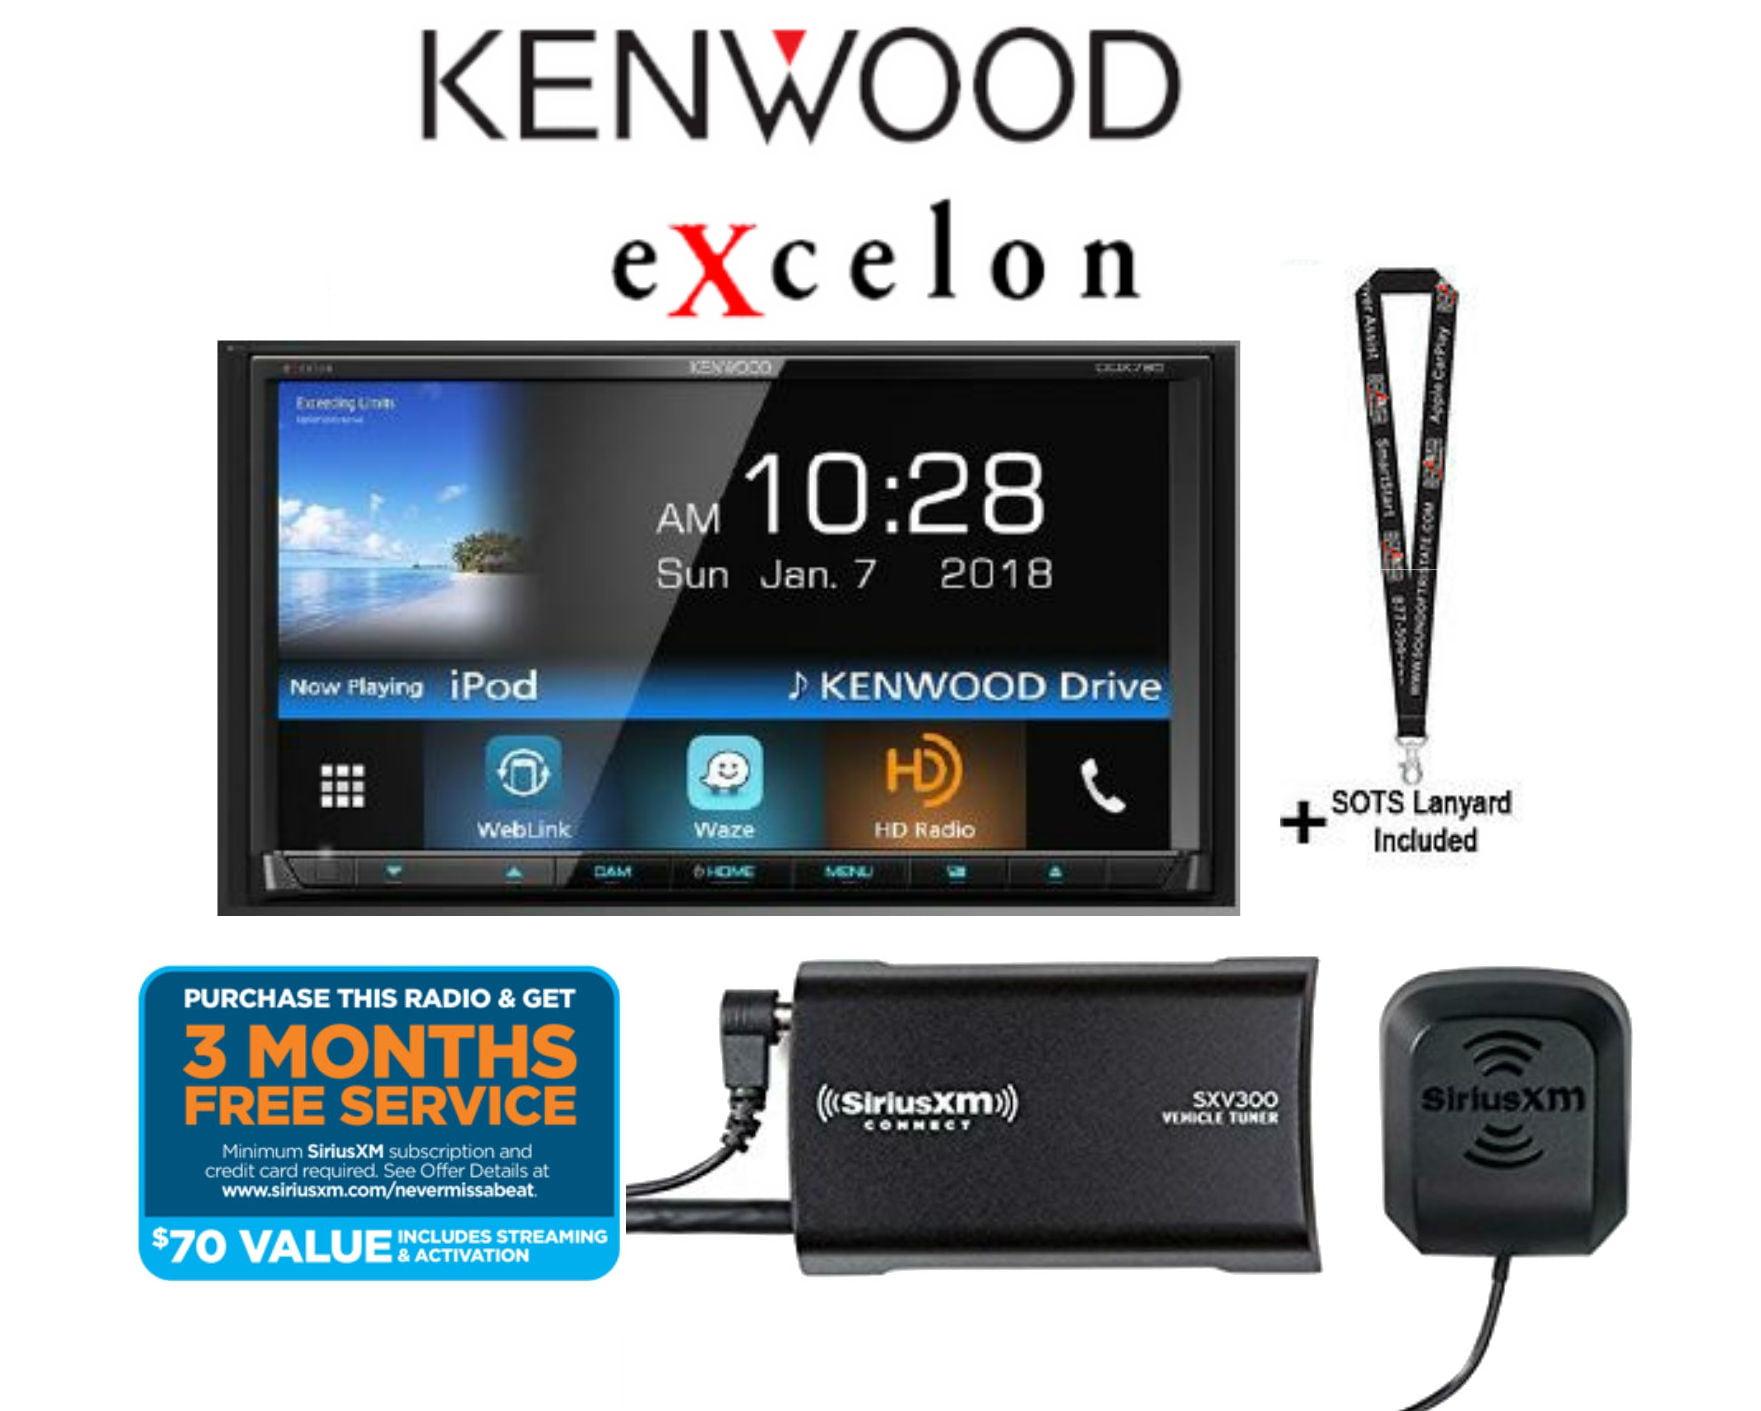 "Kenwood eXcelon DDX795 w  Sirius XM SXV300KV1 6.95"" WVGA DVD Receiver w  Bluetooth & HD Radio w  Satellite Radio... by Kenwood"